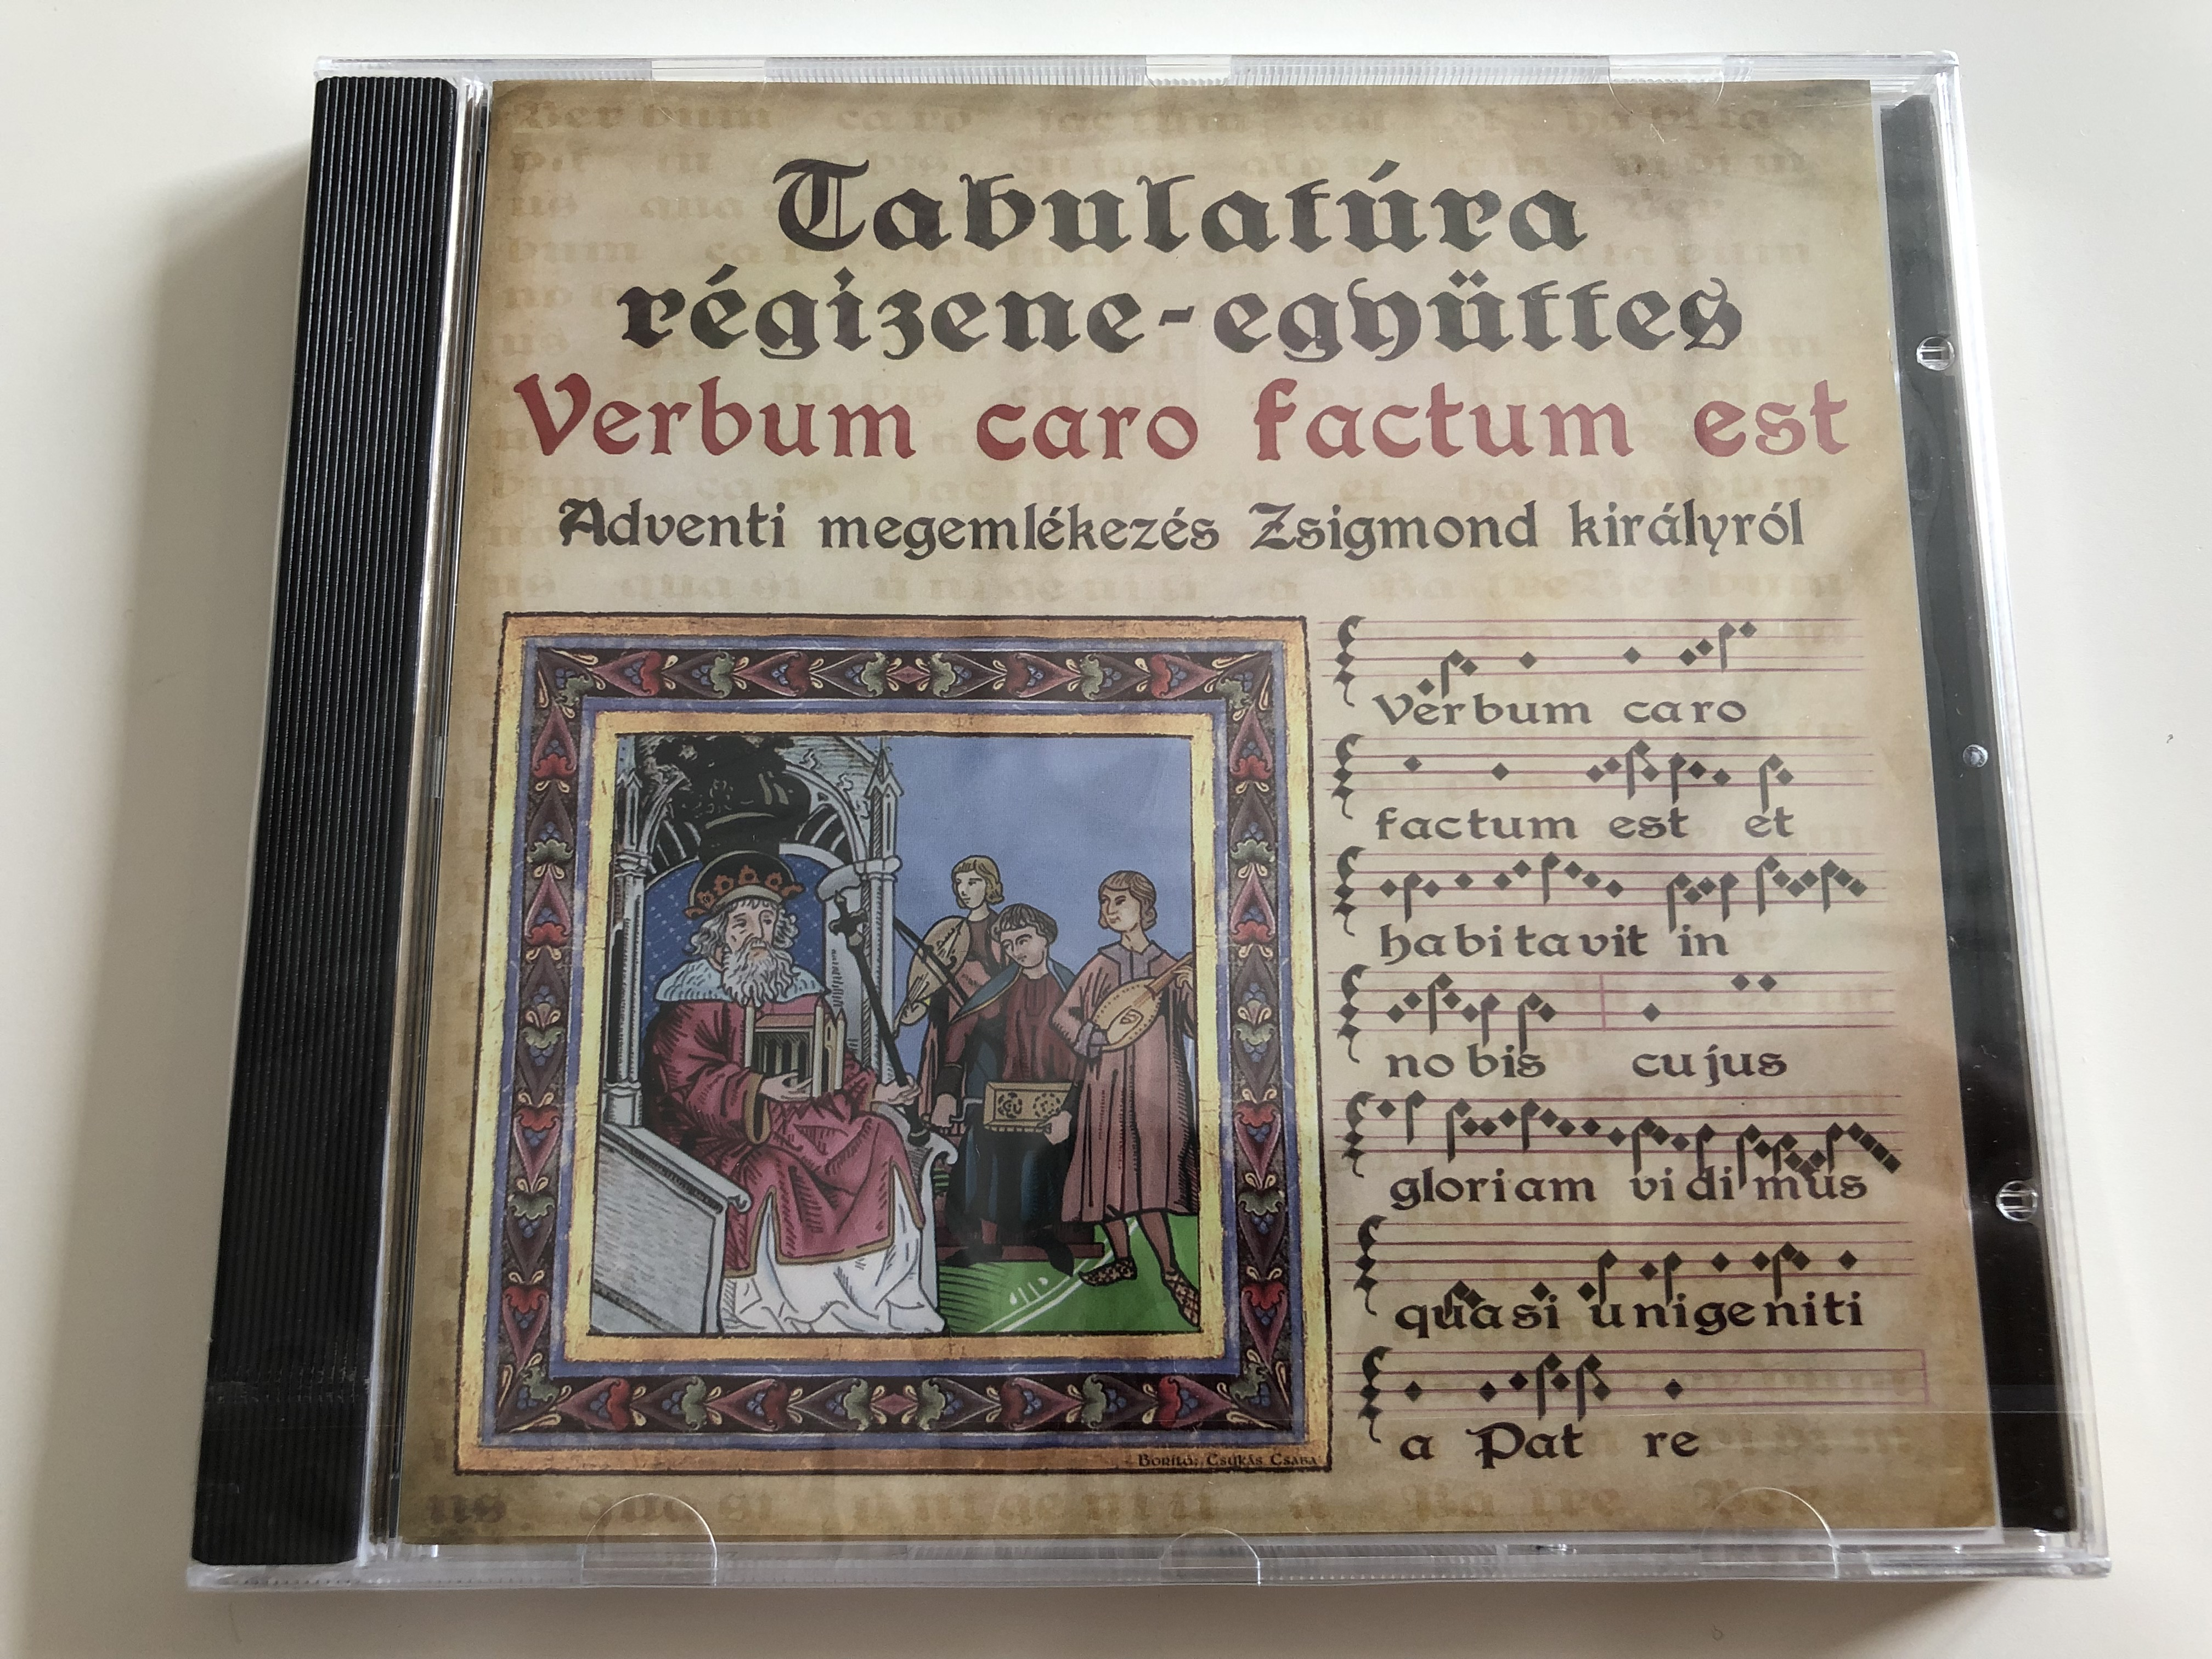 tabulat-ra-r-gizene-egy-ttes-verbum-caro-factum-est-audio-cd-adventi-megeml-kez-s-zsigmond-kir-lyr-l-a-commemoration-of-king-sigismundus-at-advent-allegro-thaler-2007-mza-090-1-.jpg